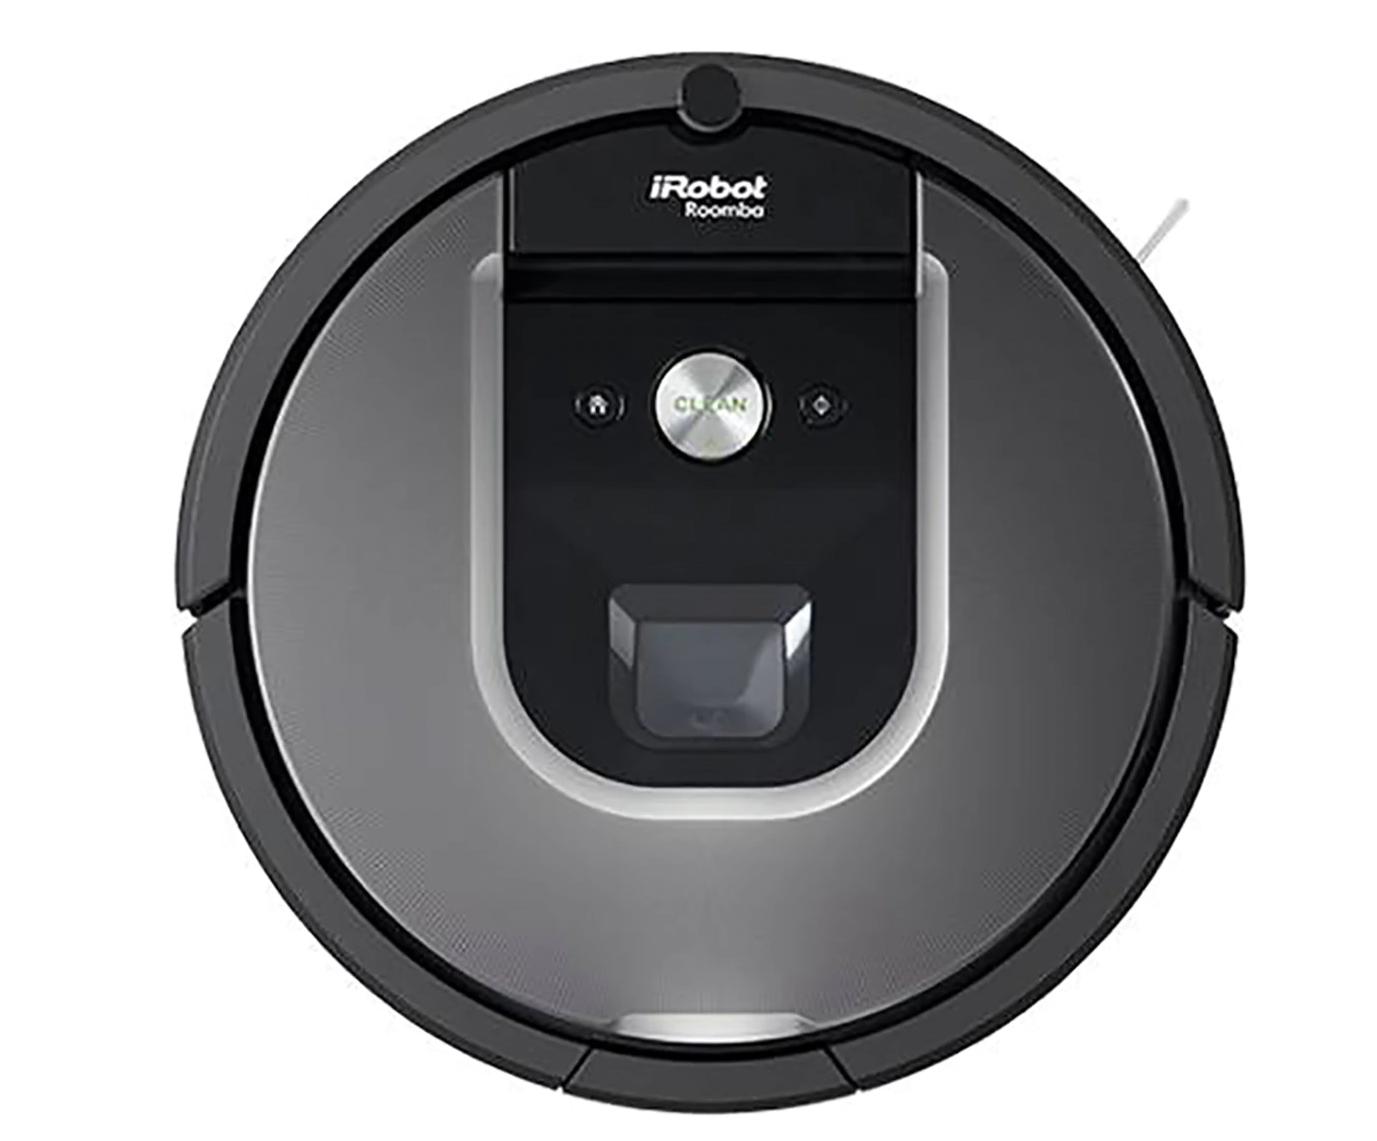 Robot aspirador iRobot Roomba 960